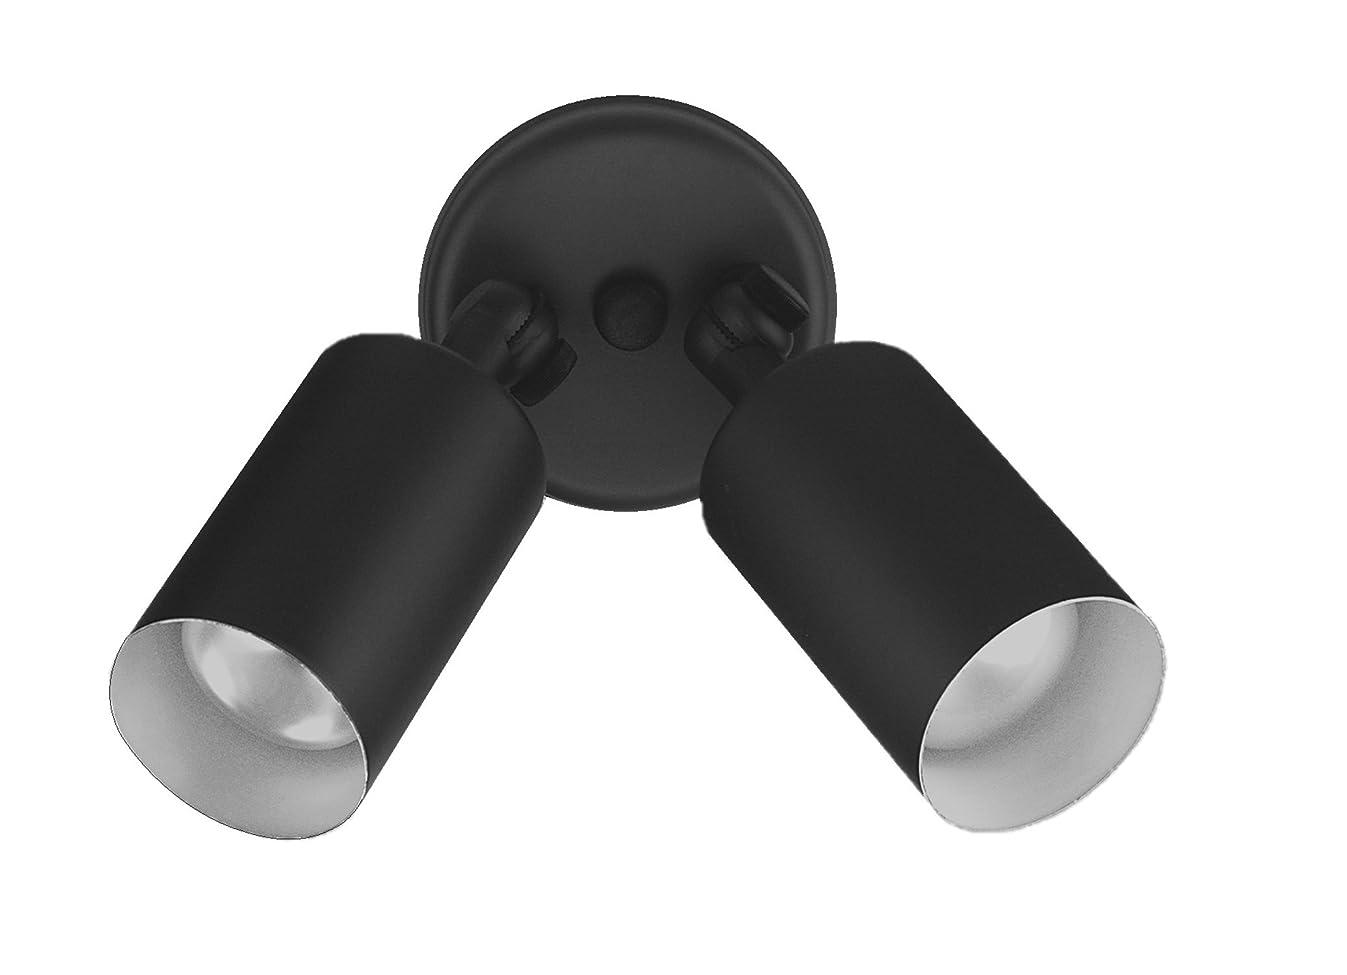 NICOR Lighting 75-Watt Double Bullet Adjustable Flood Light, Black (11721)